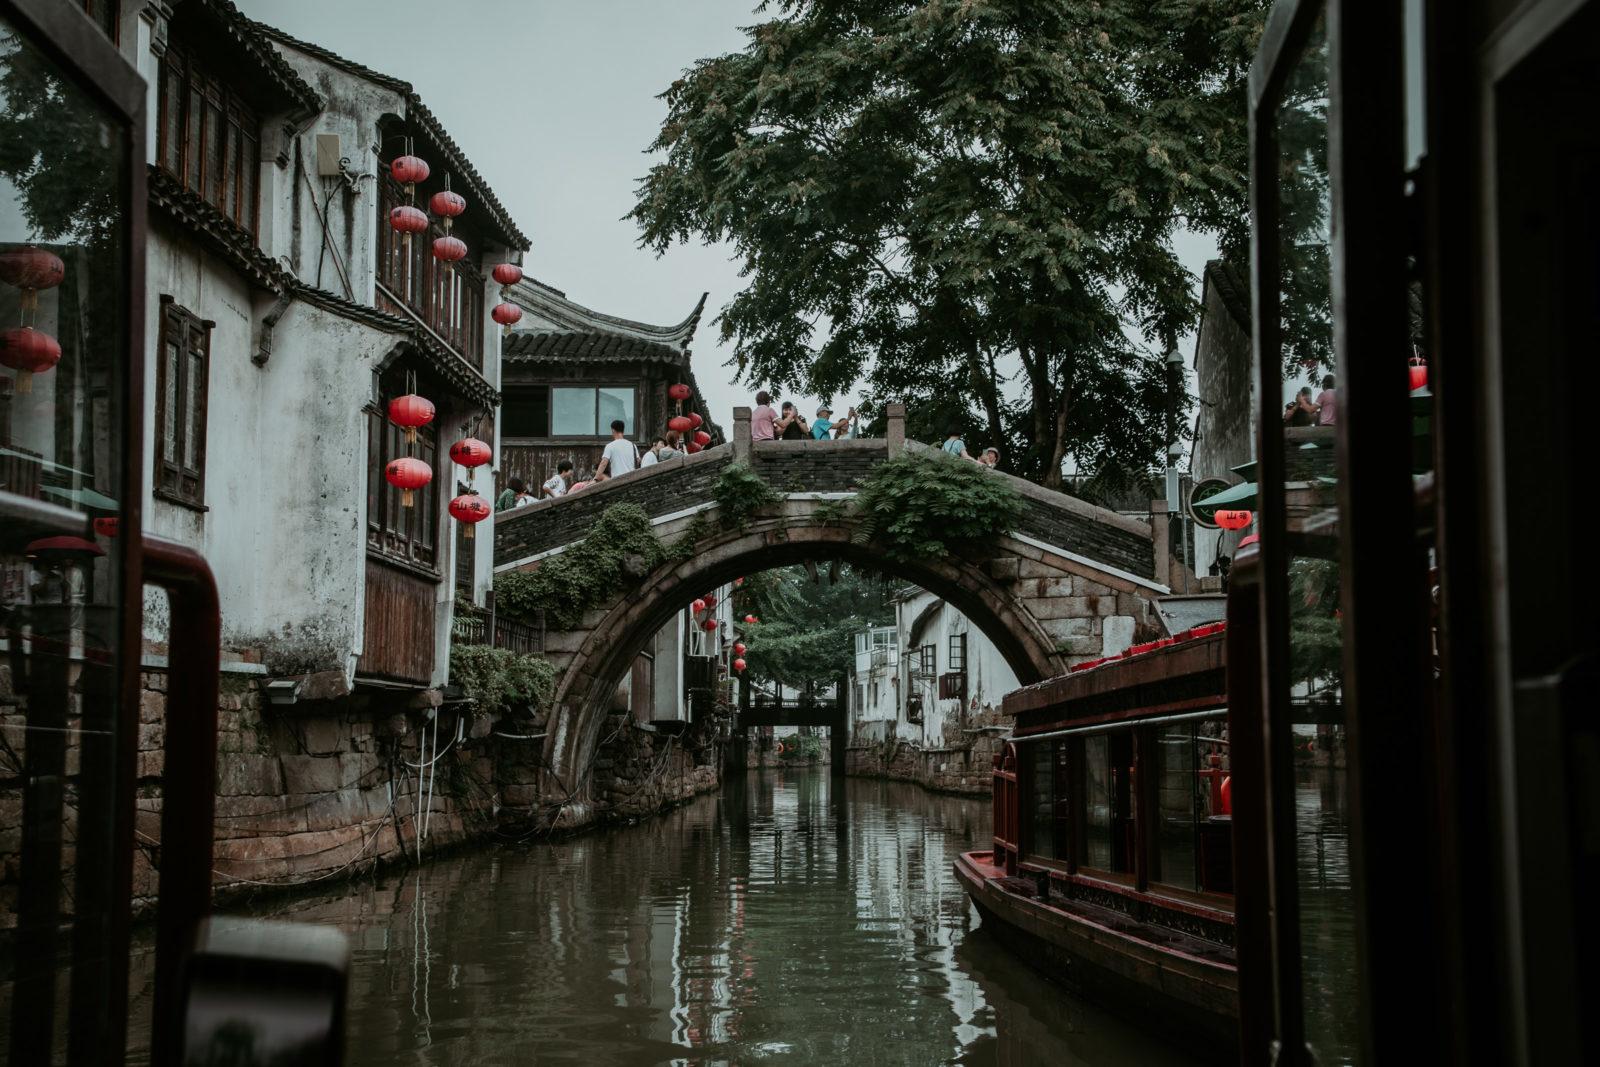 Brücke Shantang Street Suzhou Sehenswürdigkeiten China